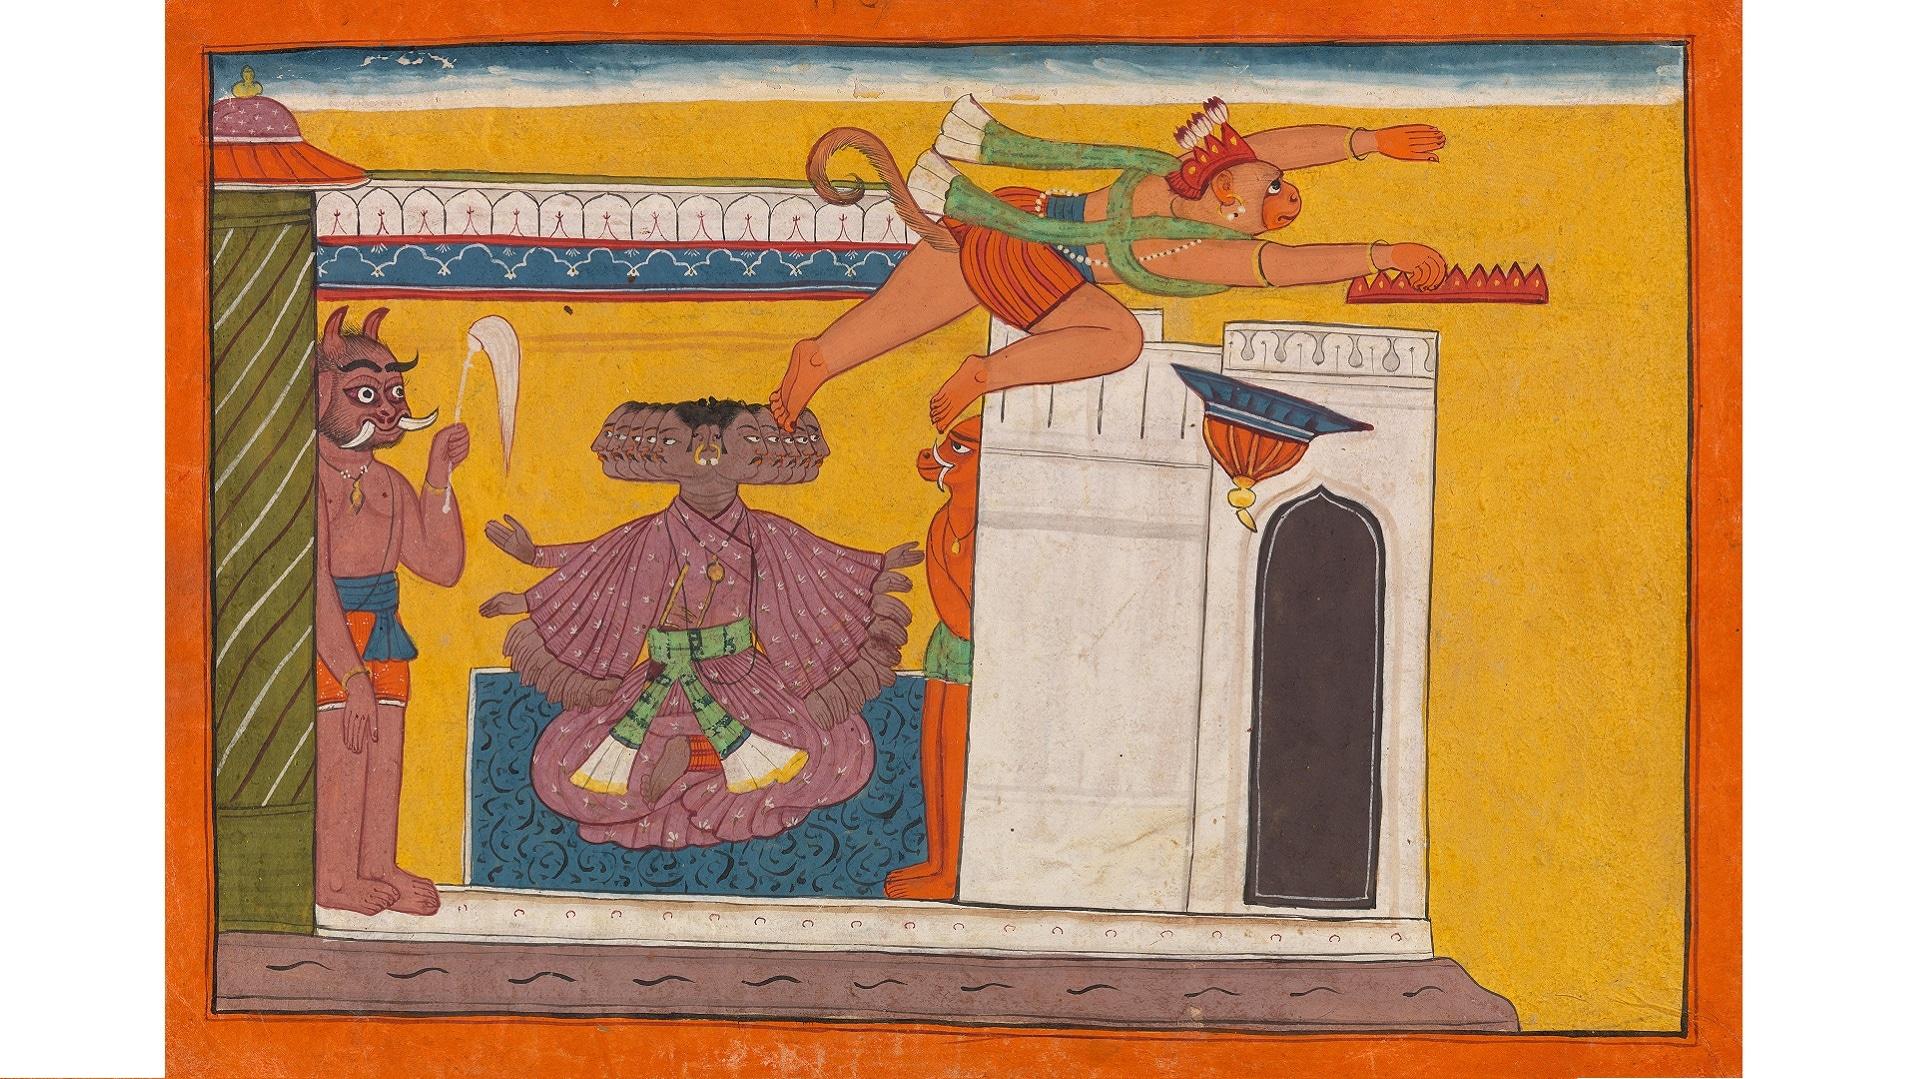 13. The Monkey Prince Angada Steals Ravana's Crown